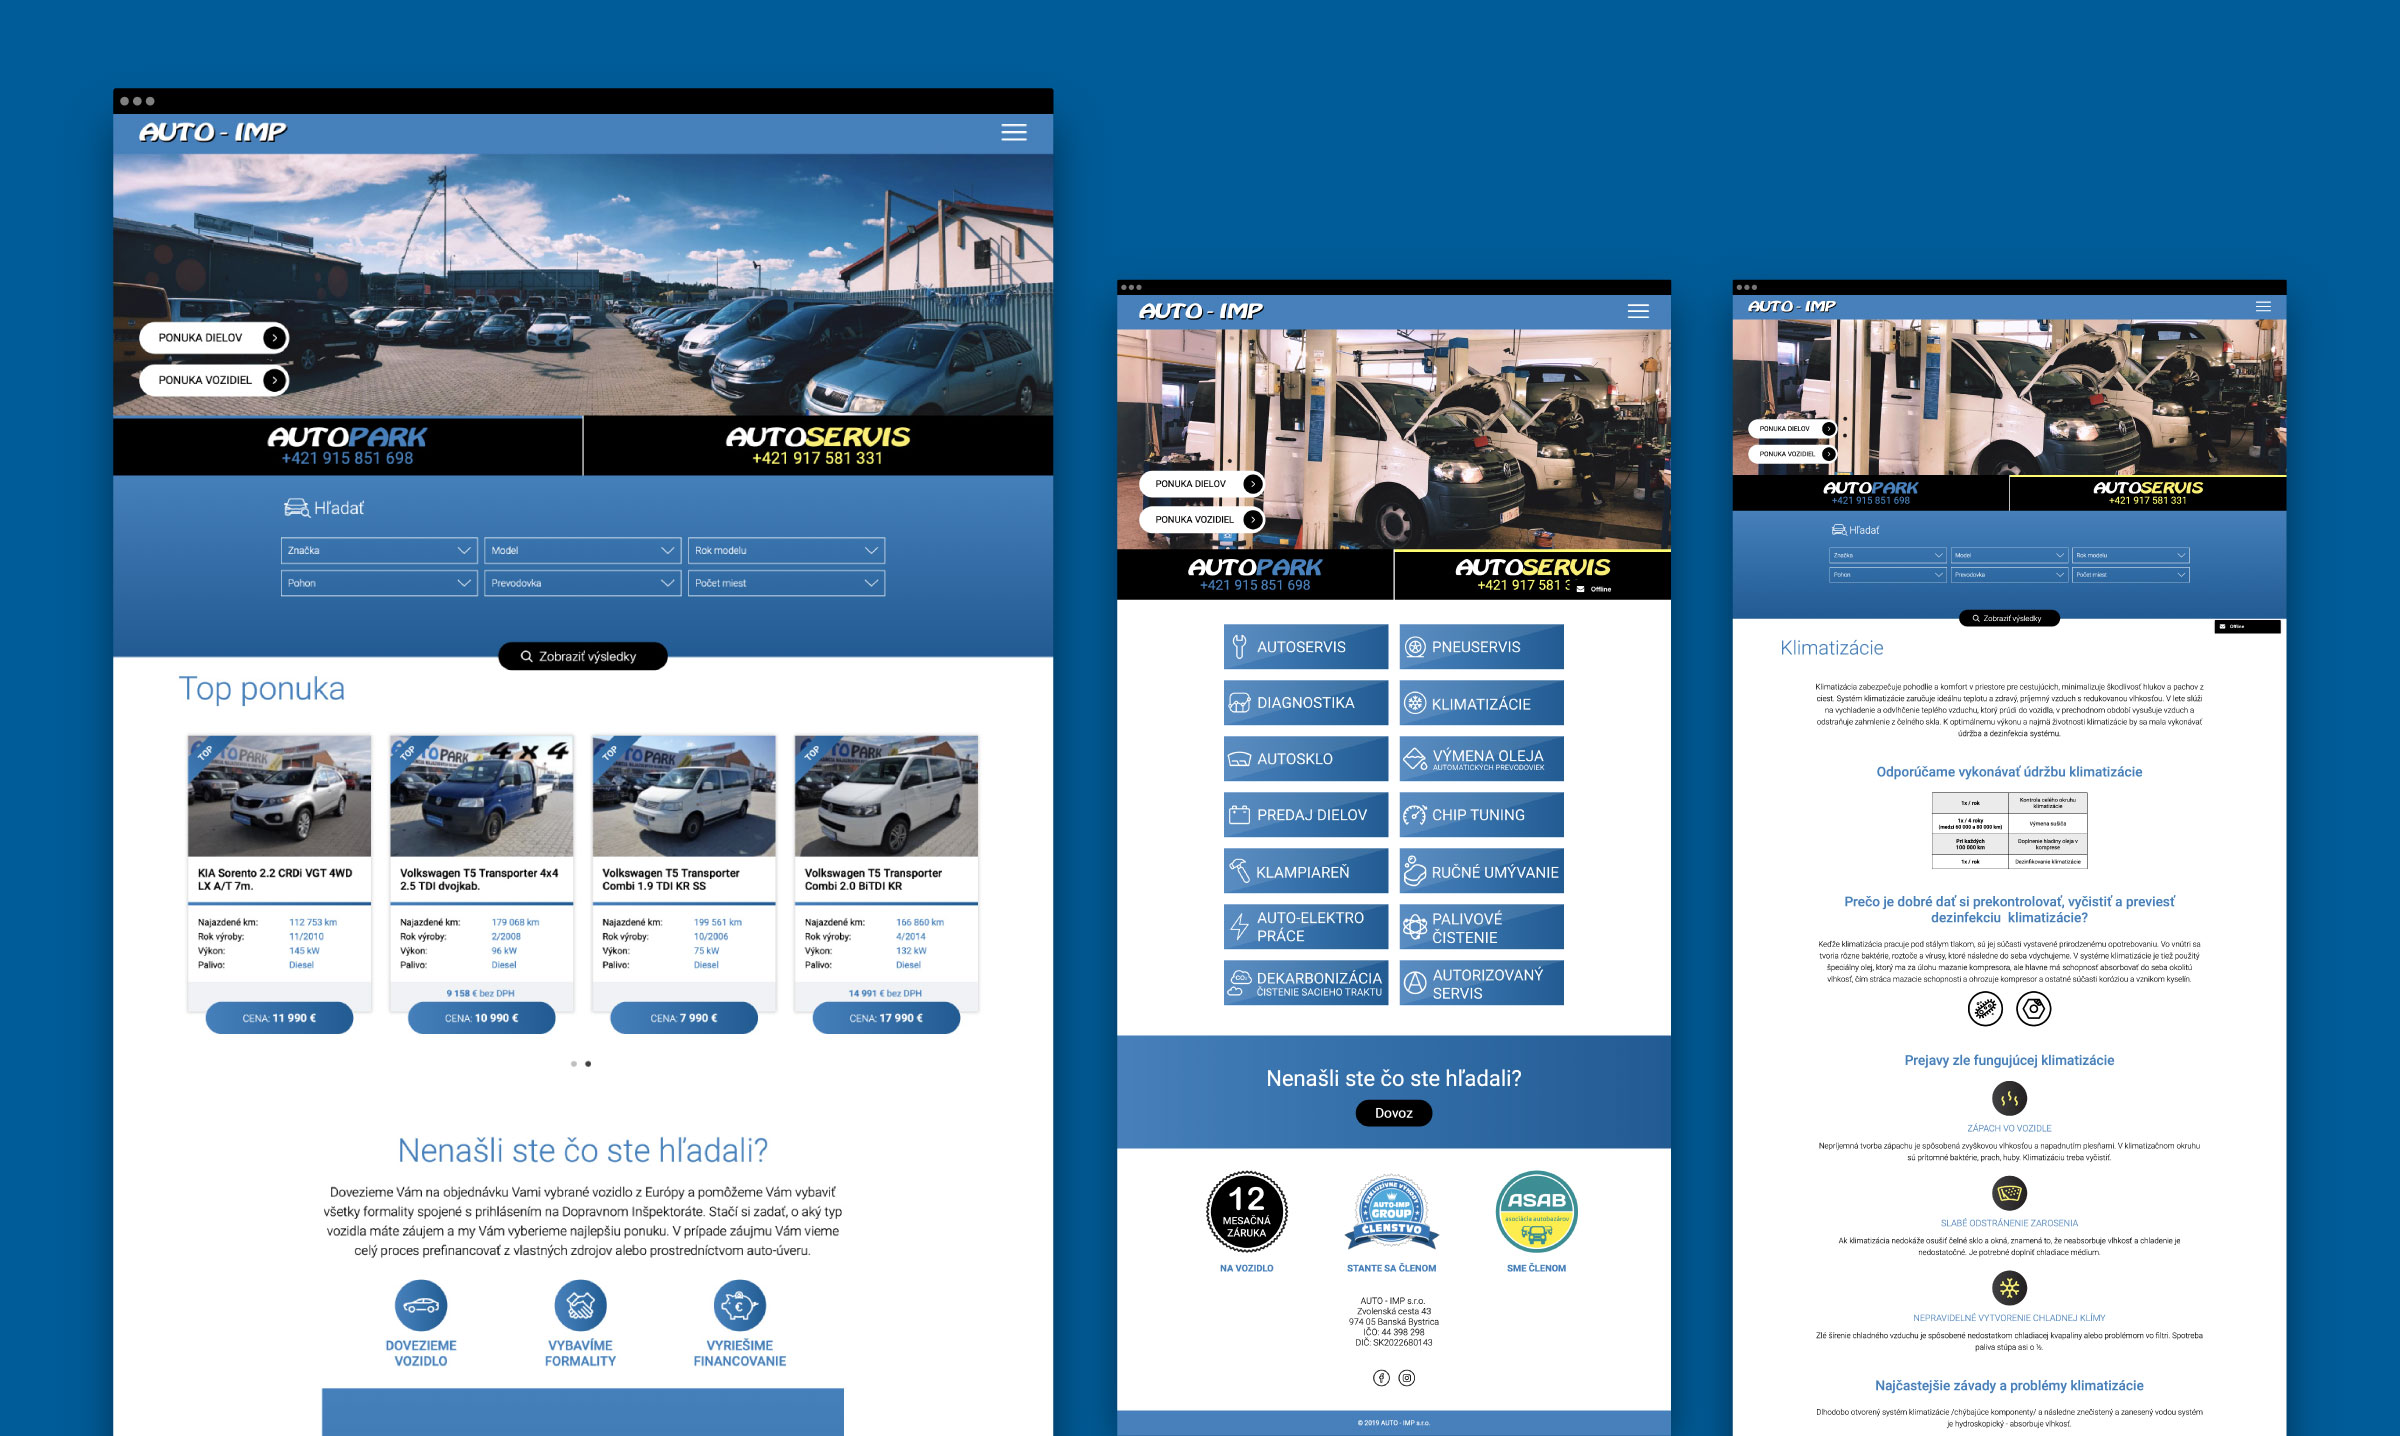 AUTO-IMP webstránka